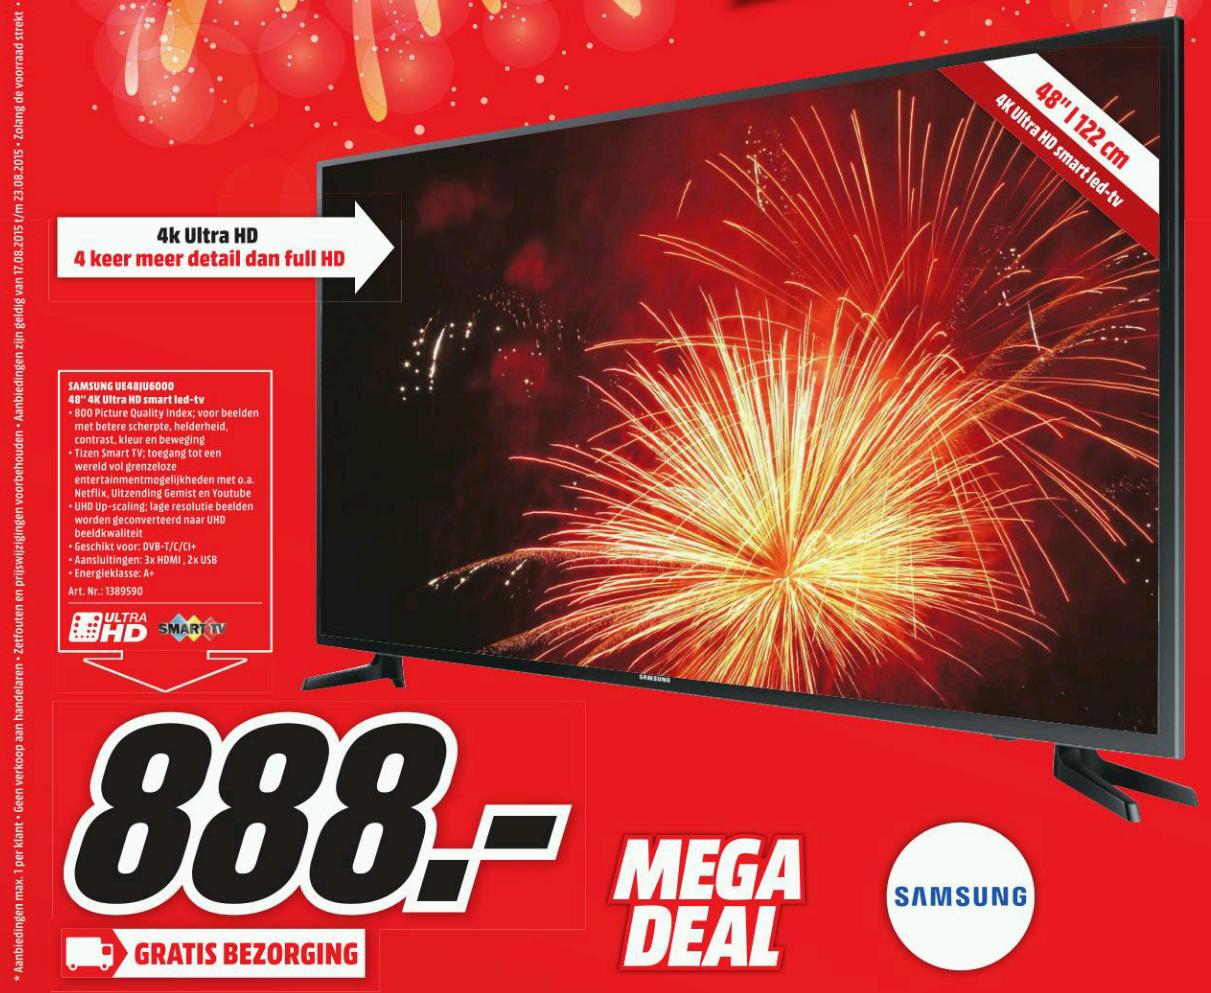 Samsung UE48JU6000W Ultra HD TV voor €888,- @ Media Markt (vanaf maandag)